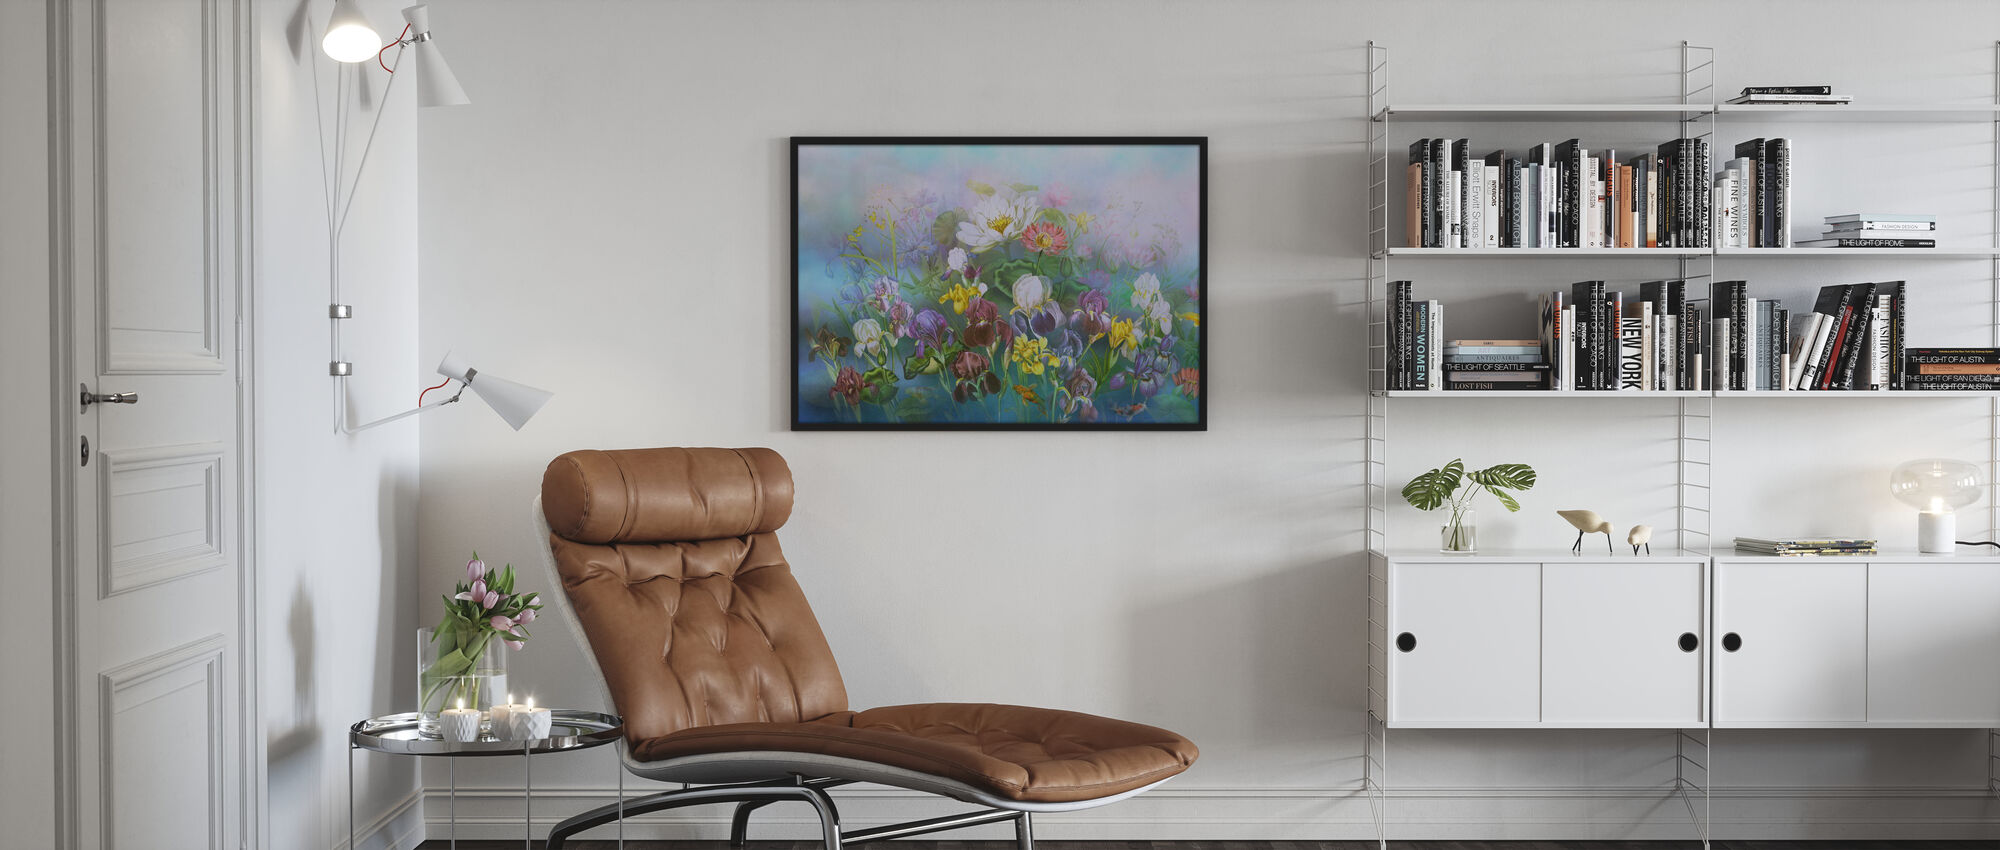 Blomma Kärlek - Poster - Vardagsrum